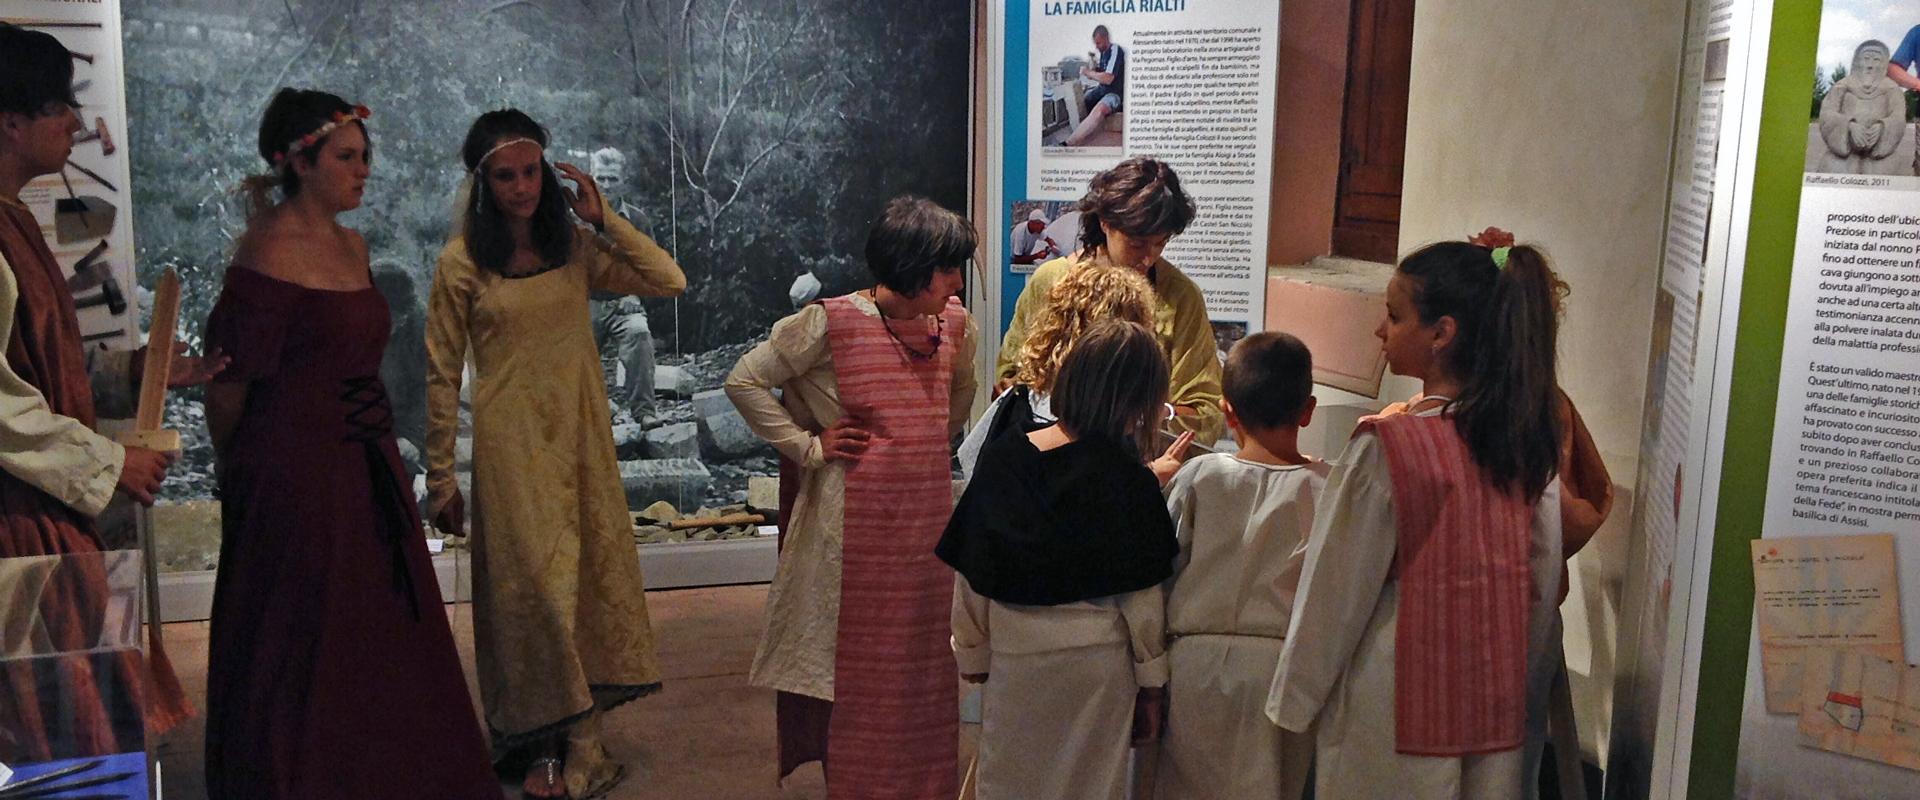 Ecomuseo a misura di bambino